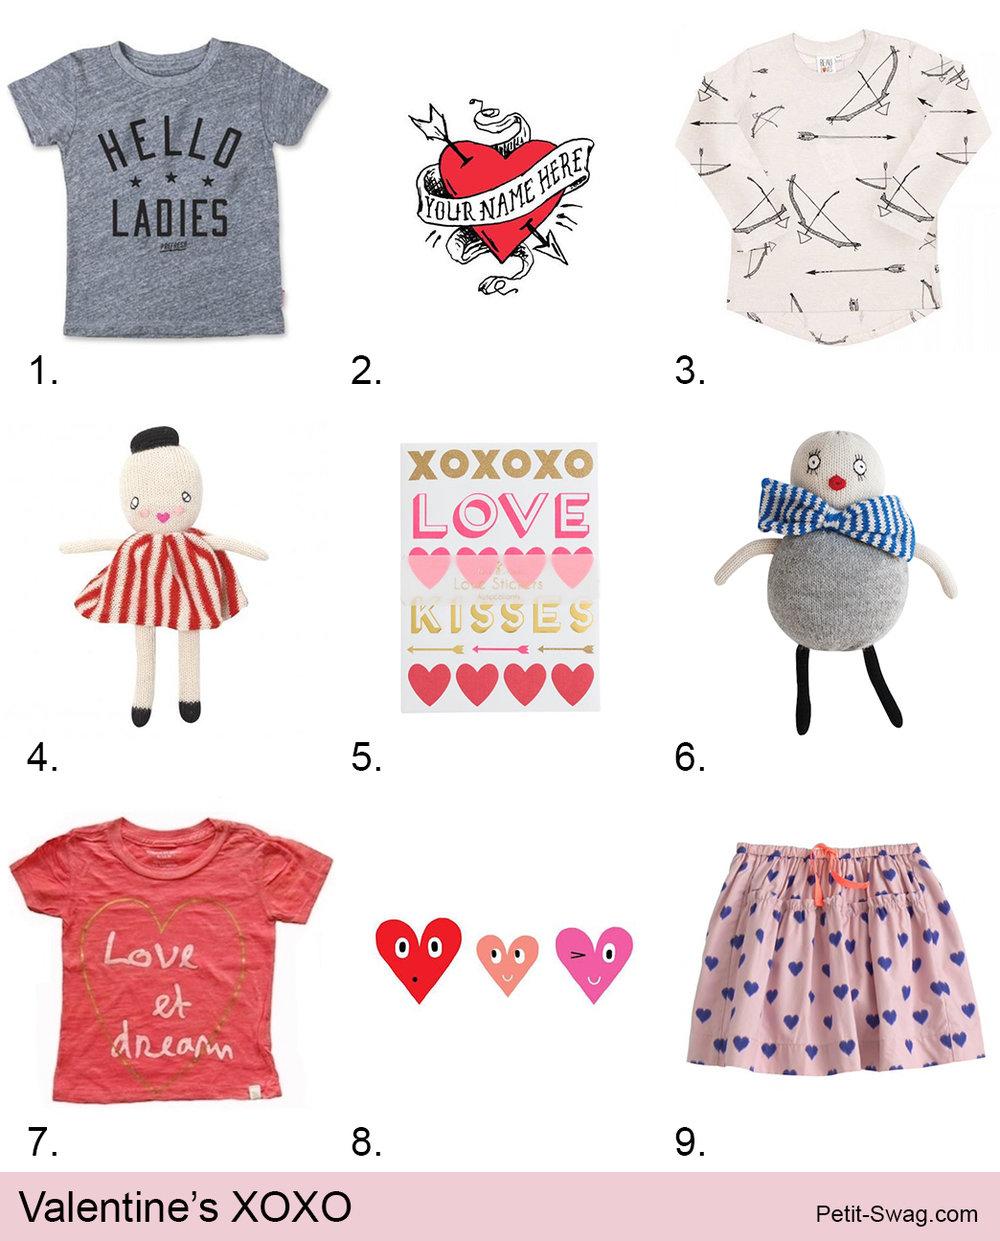 Valentine's XOXO | Petit-Swag.com